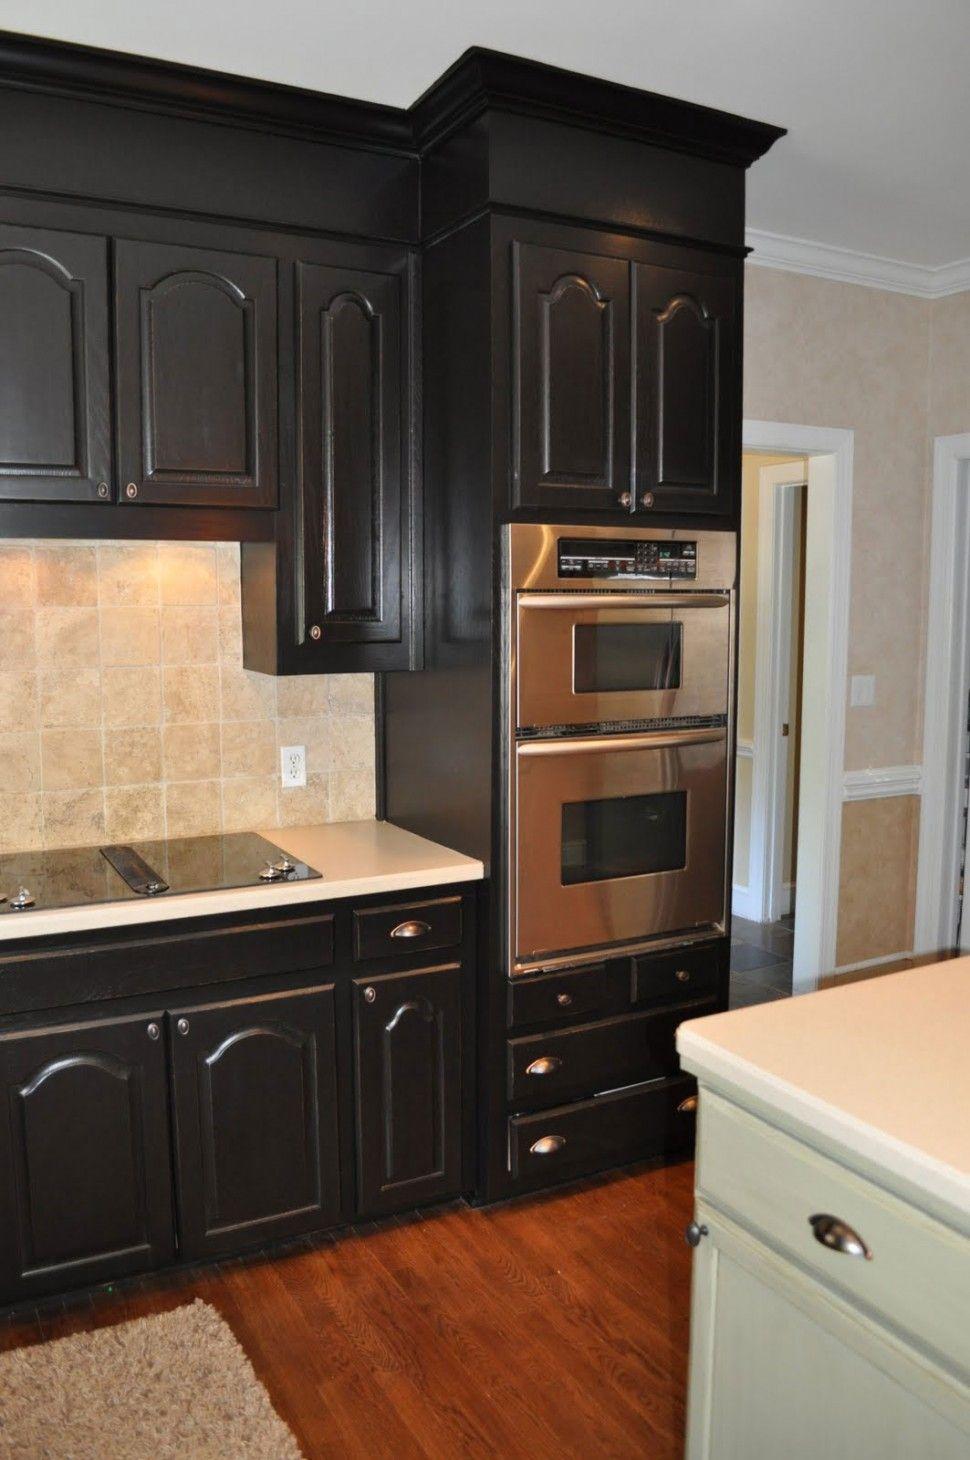 Home Interior, Black Kitchen the Amazing Kitchen